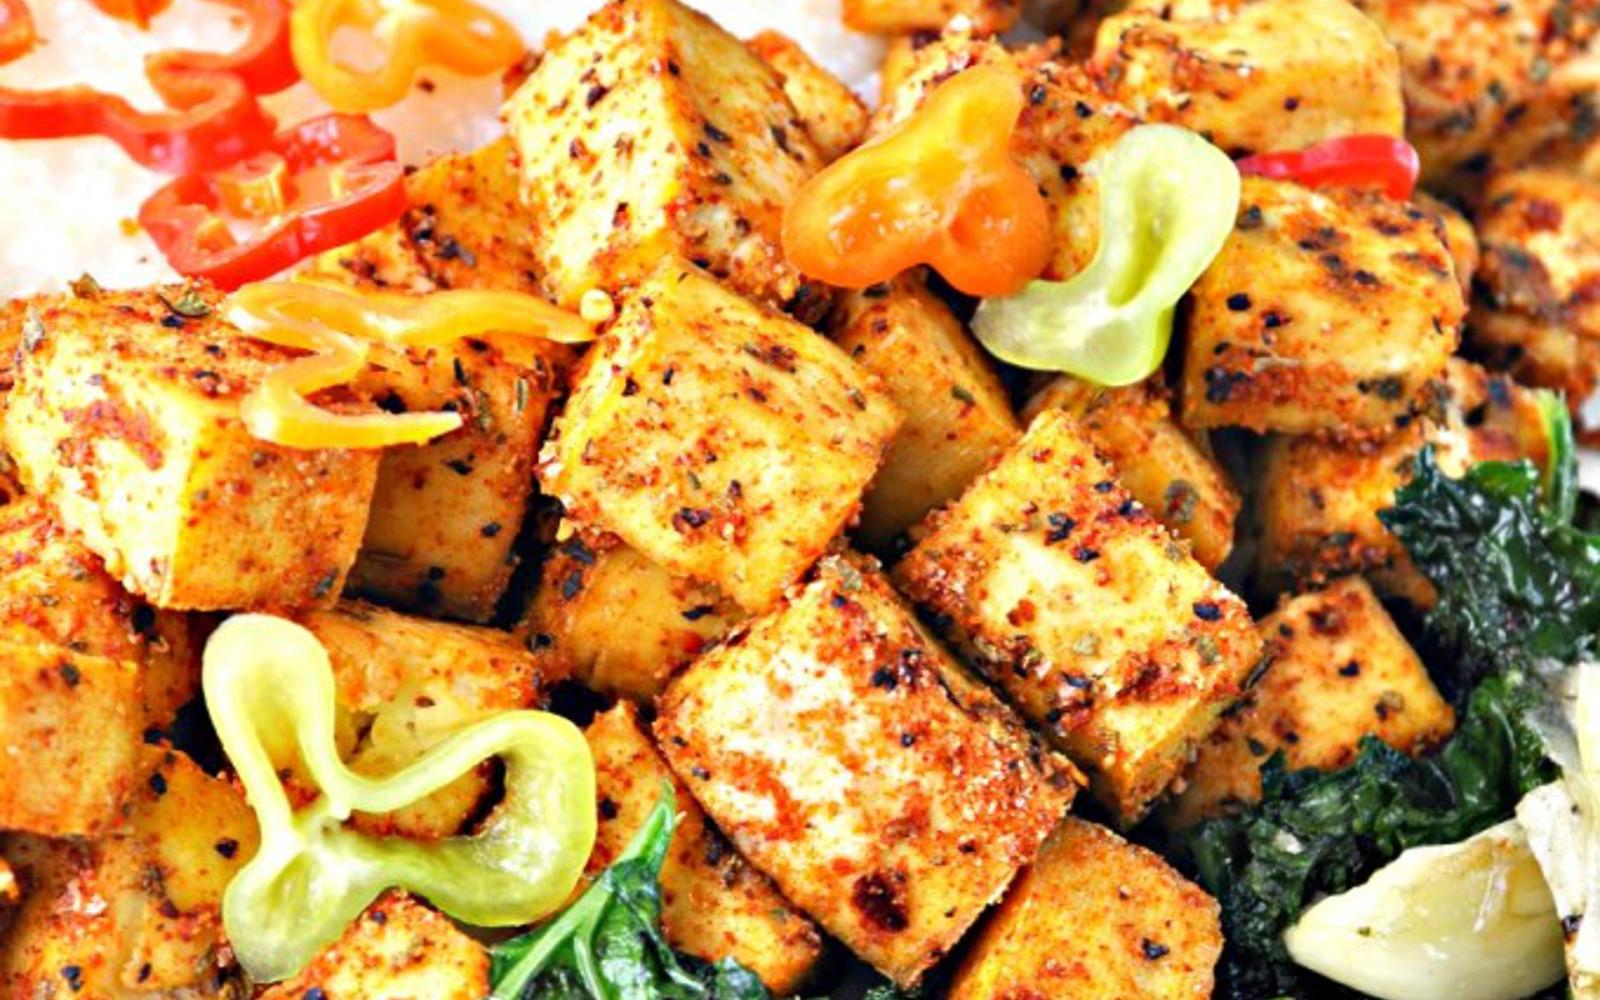 Vegan Cajun Tofu With Creamy Grits and Collard Greens